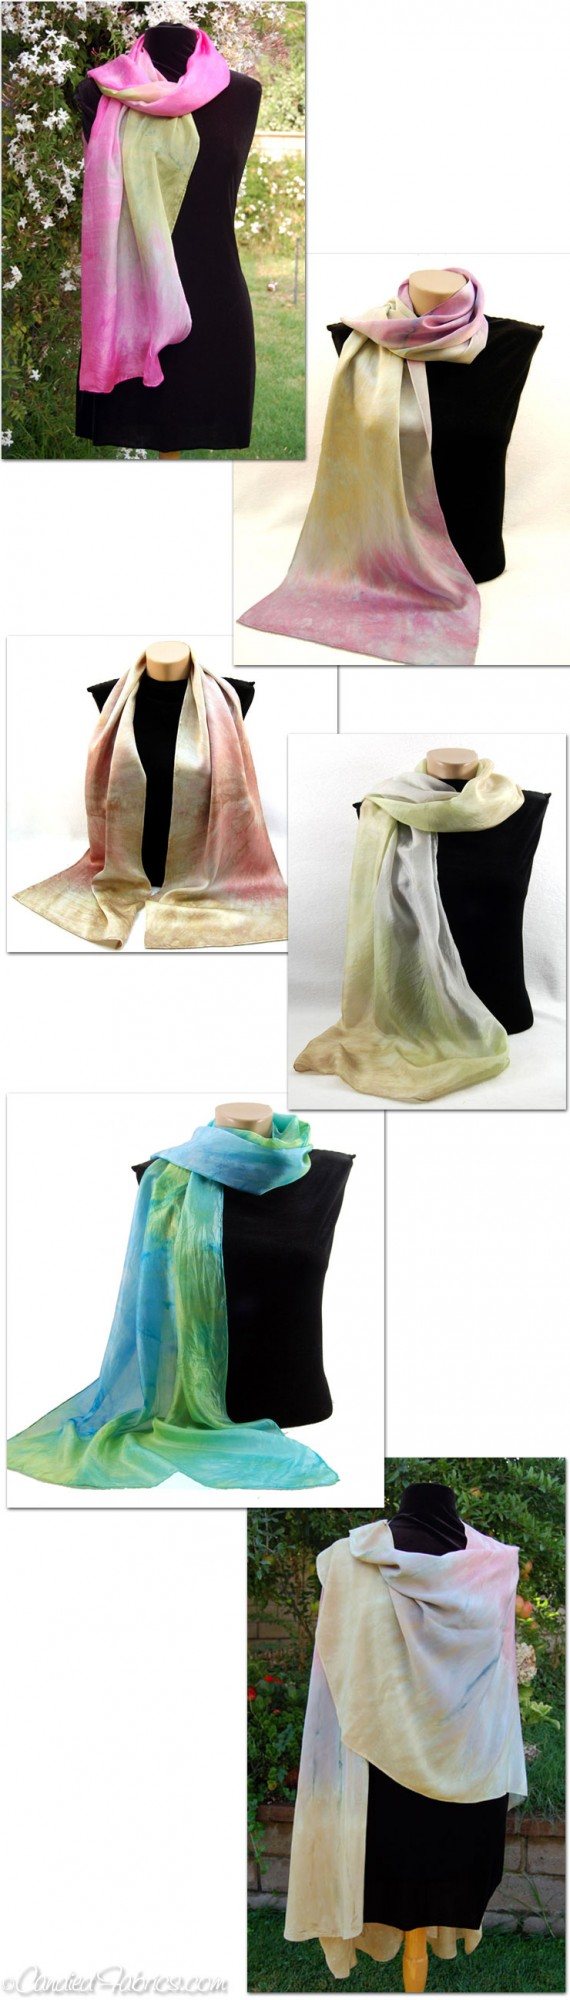 Spring-scarves